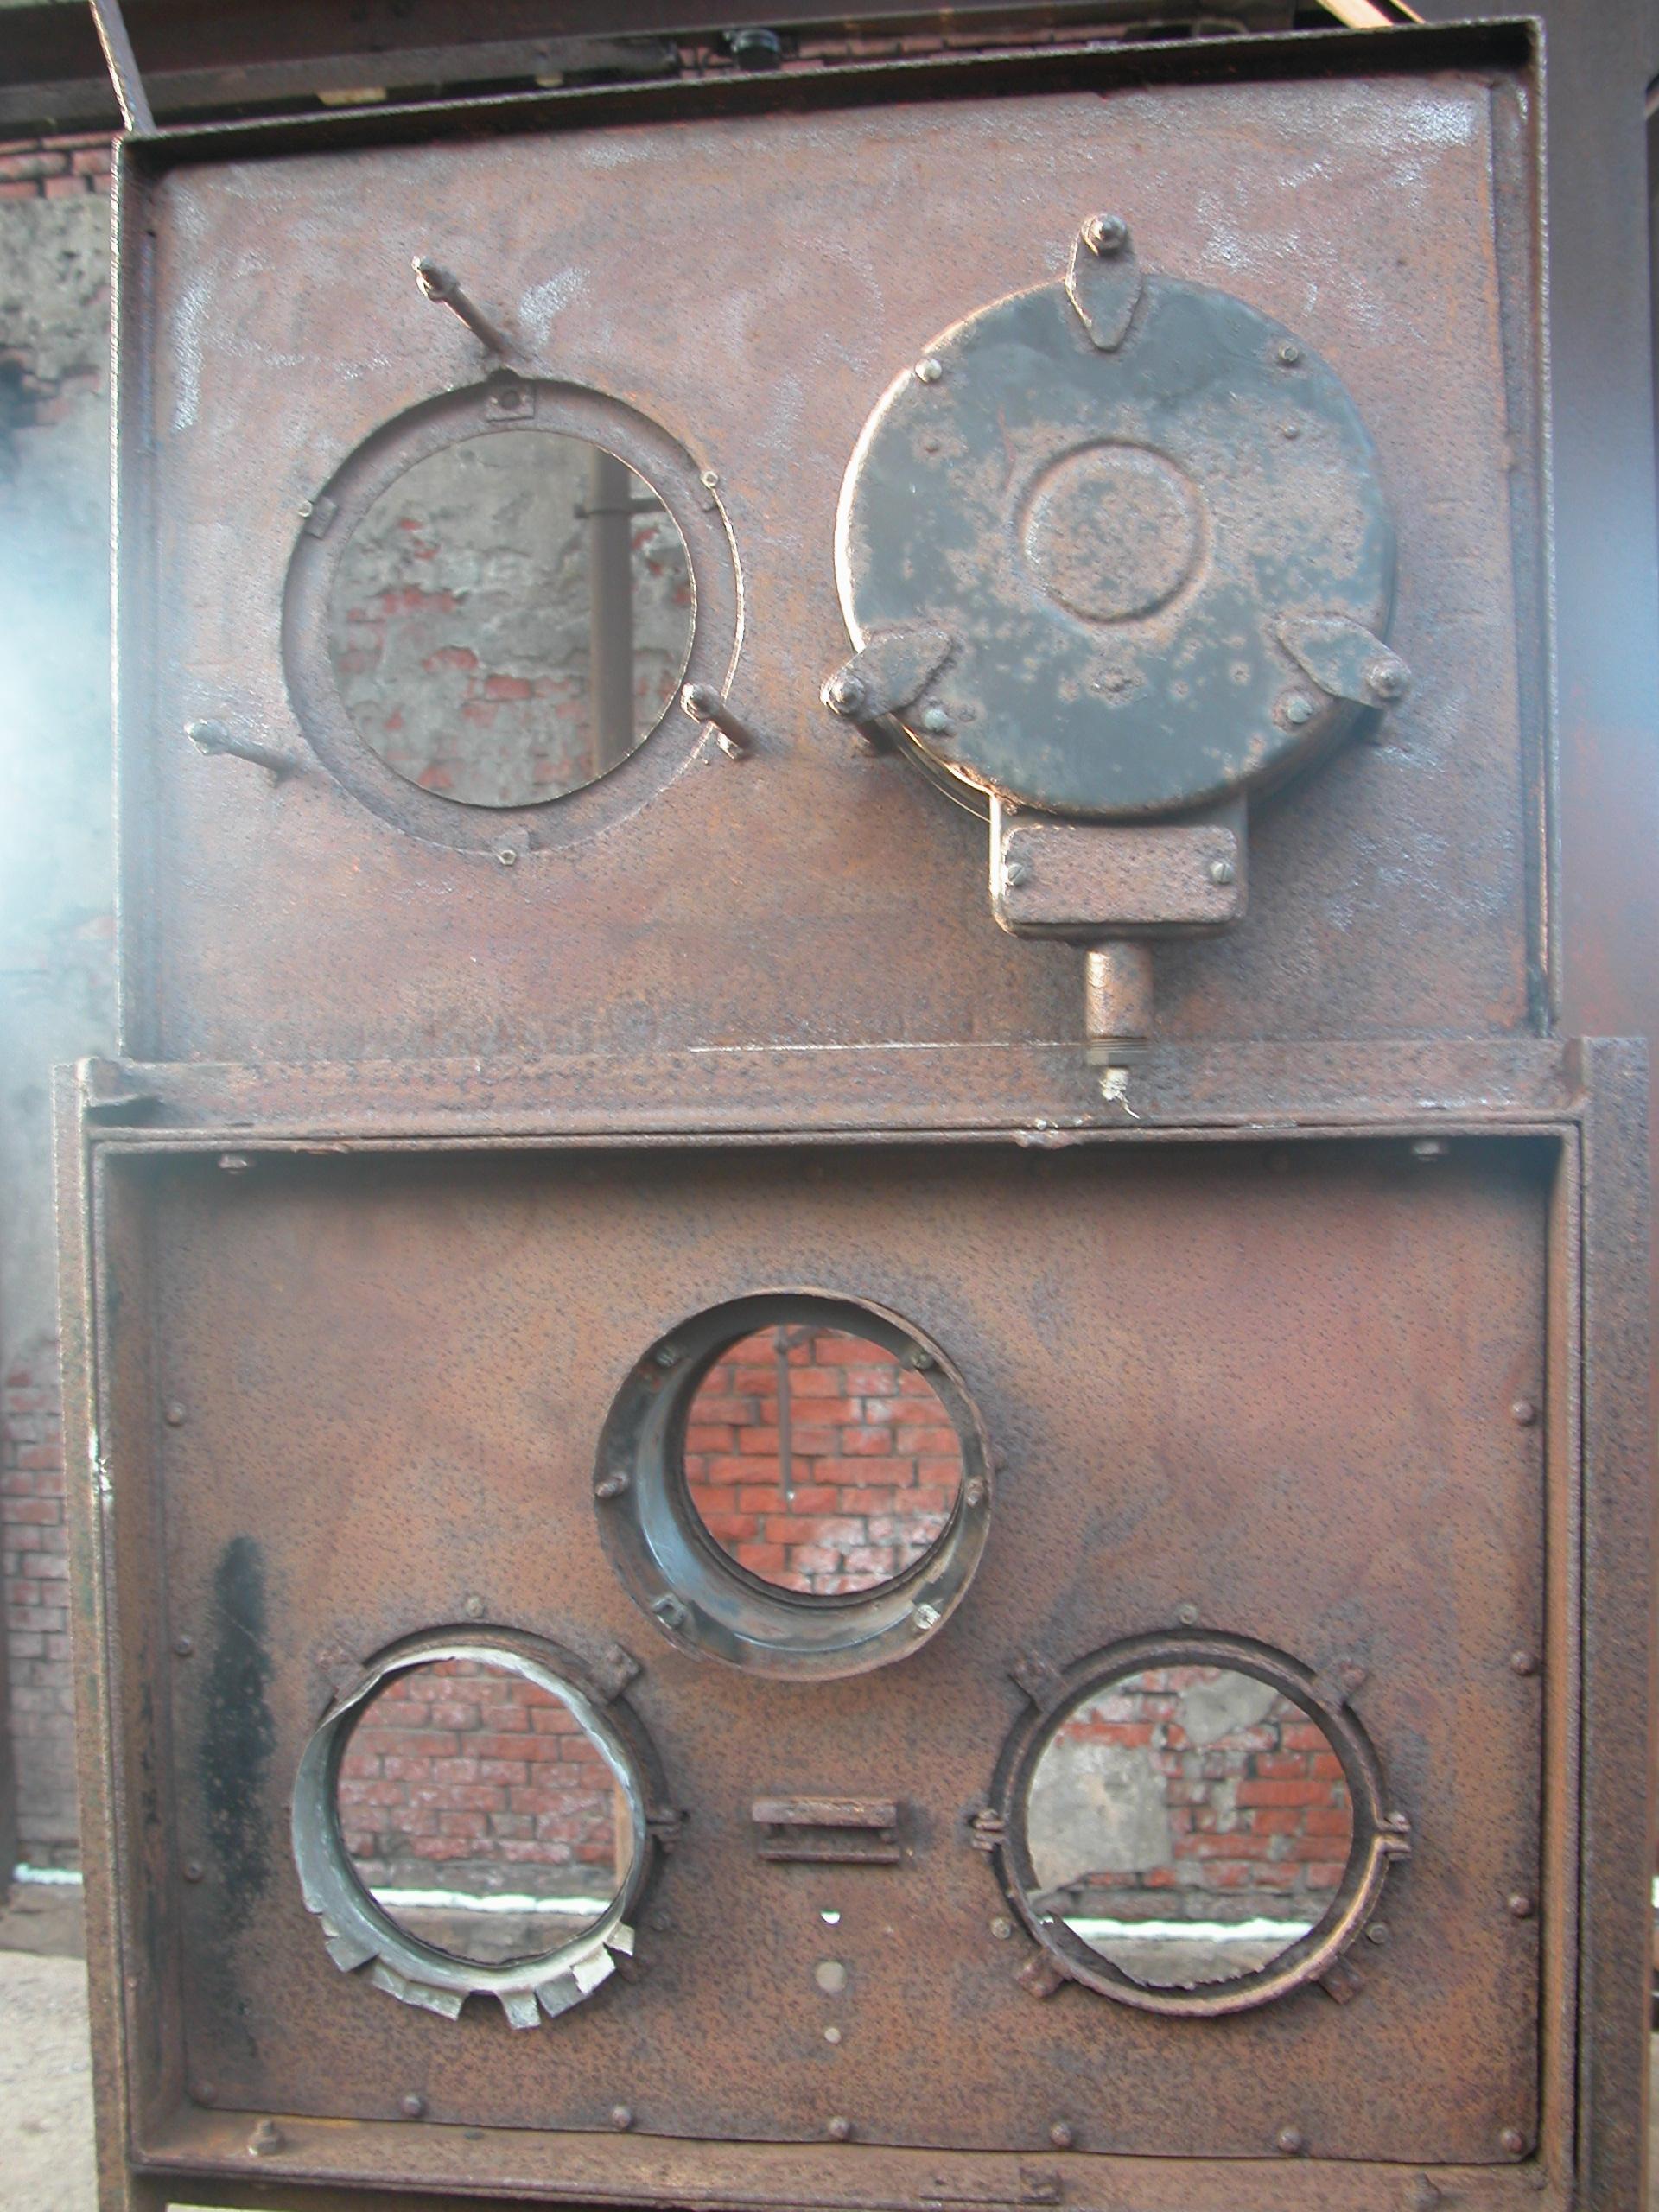 circuits circuitry metallic round holes portholes machine boiler